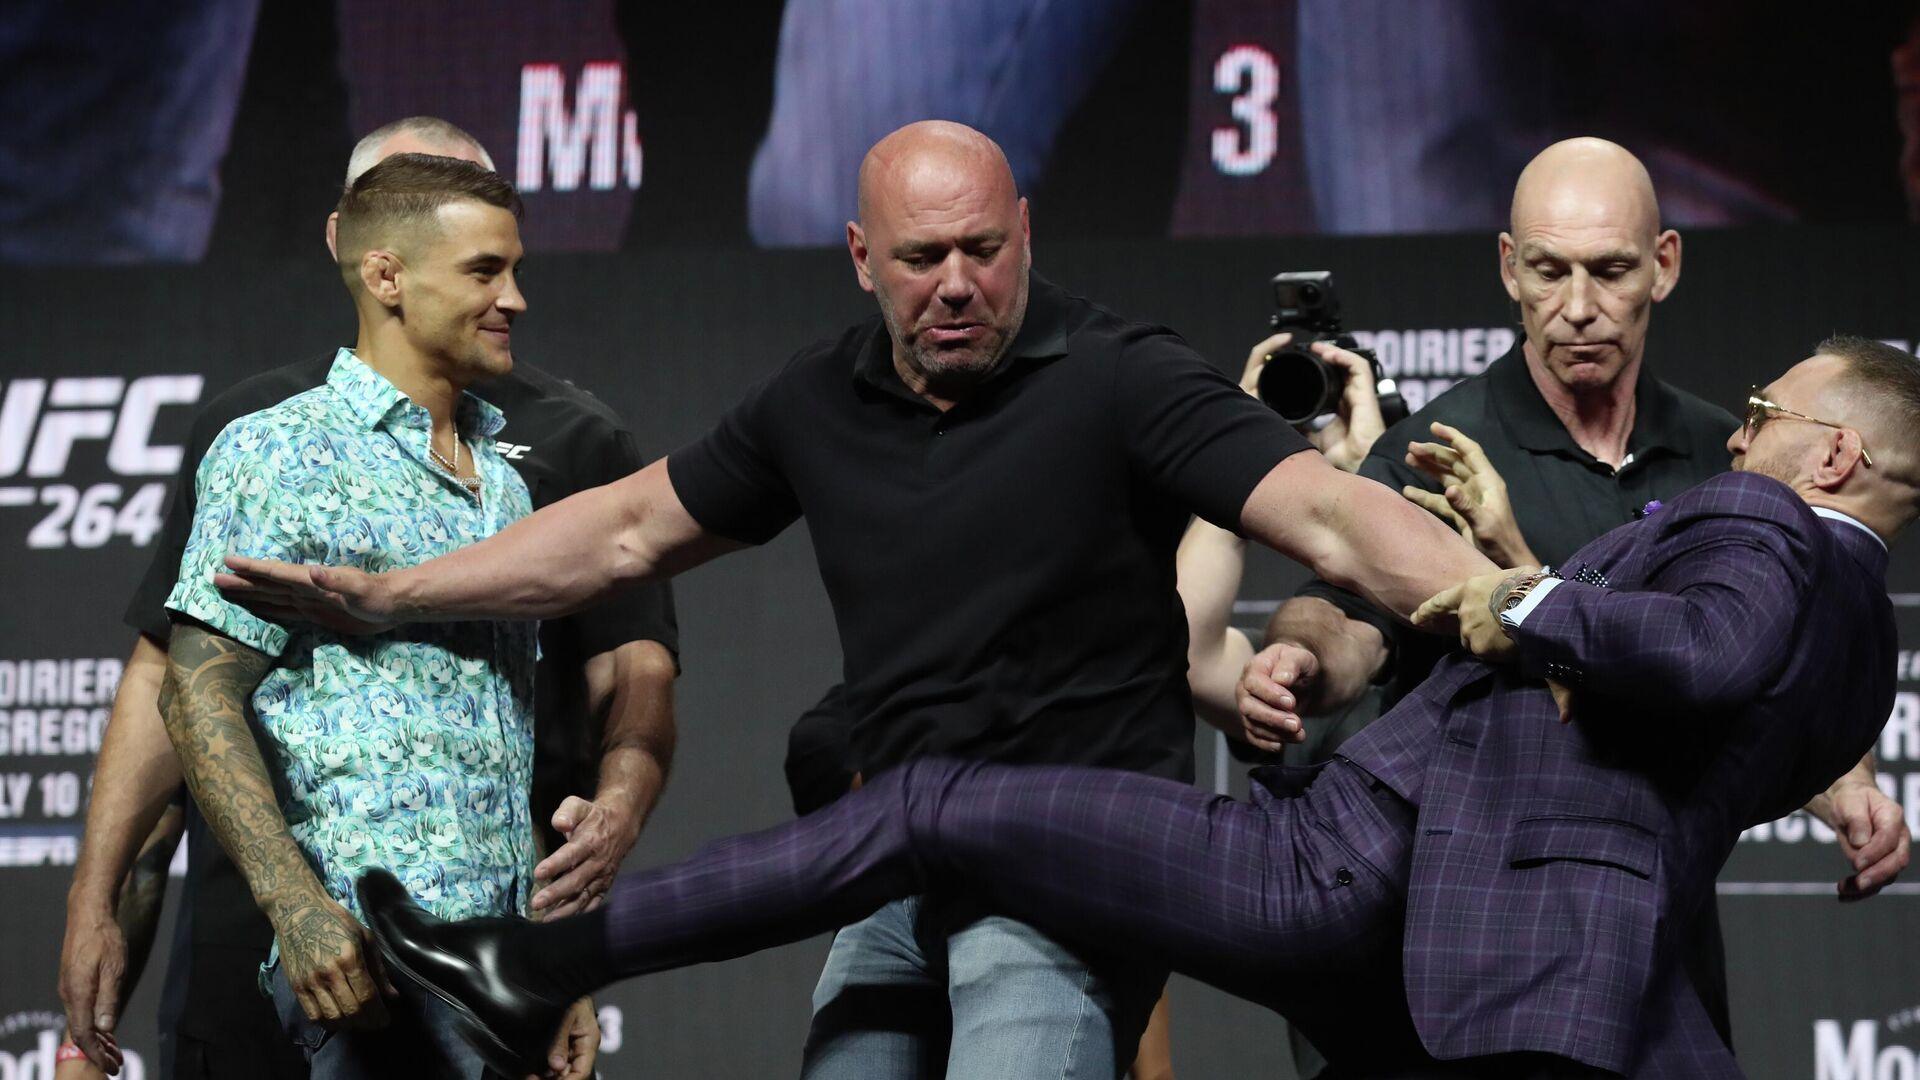 Conor McGregor versucht Fußtritt gegen Dustin Poirier, Las Vegas, USA, Juli 2021  - SNA, 1920, 09.07.2021